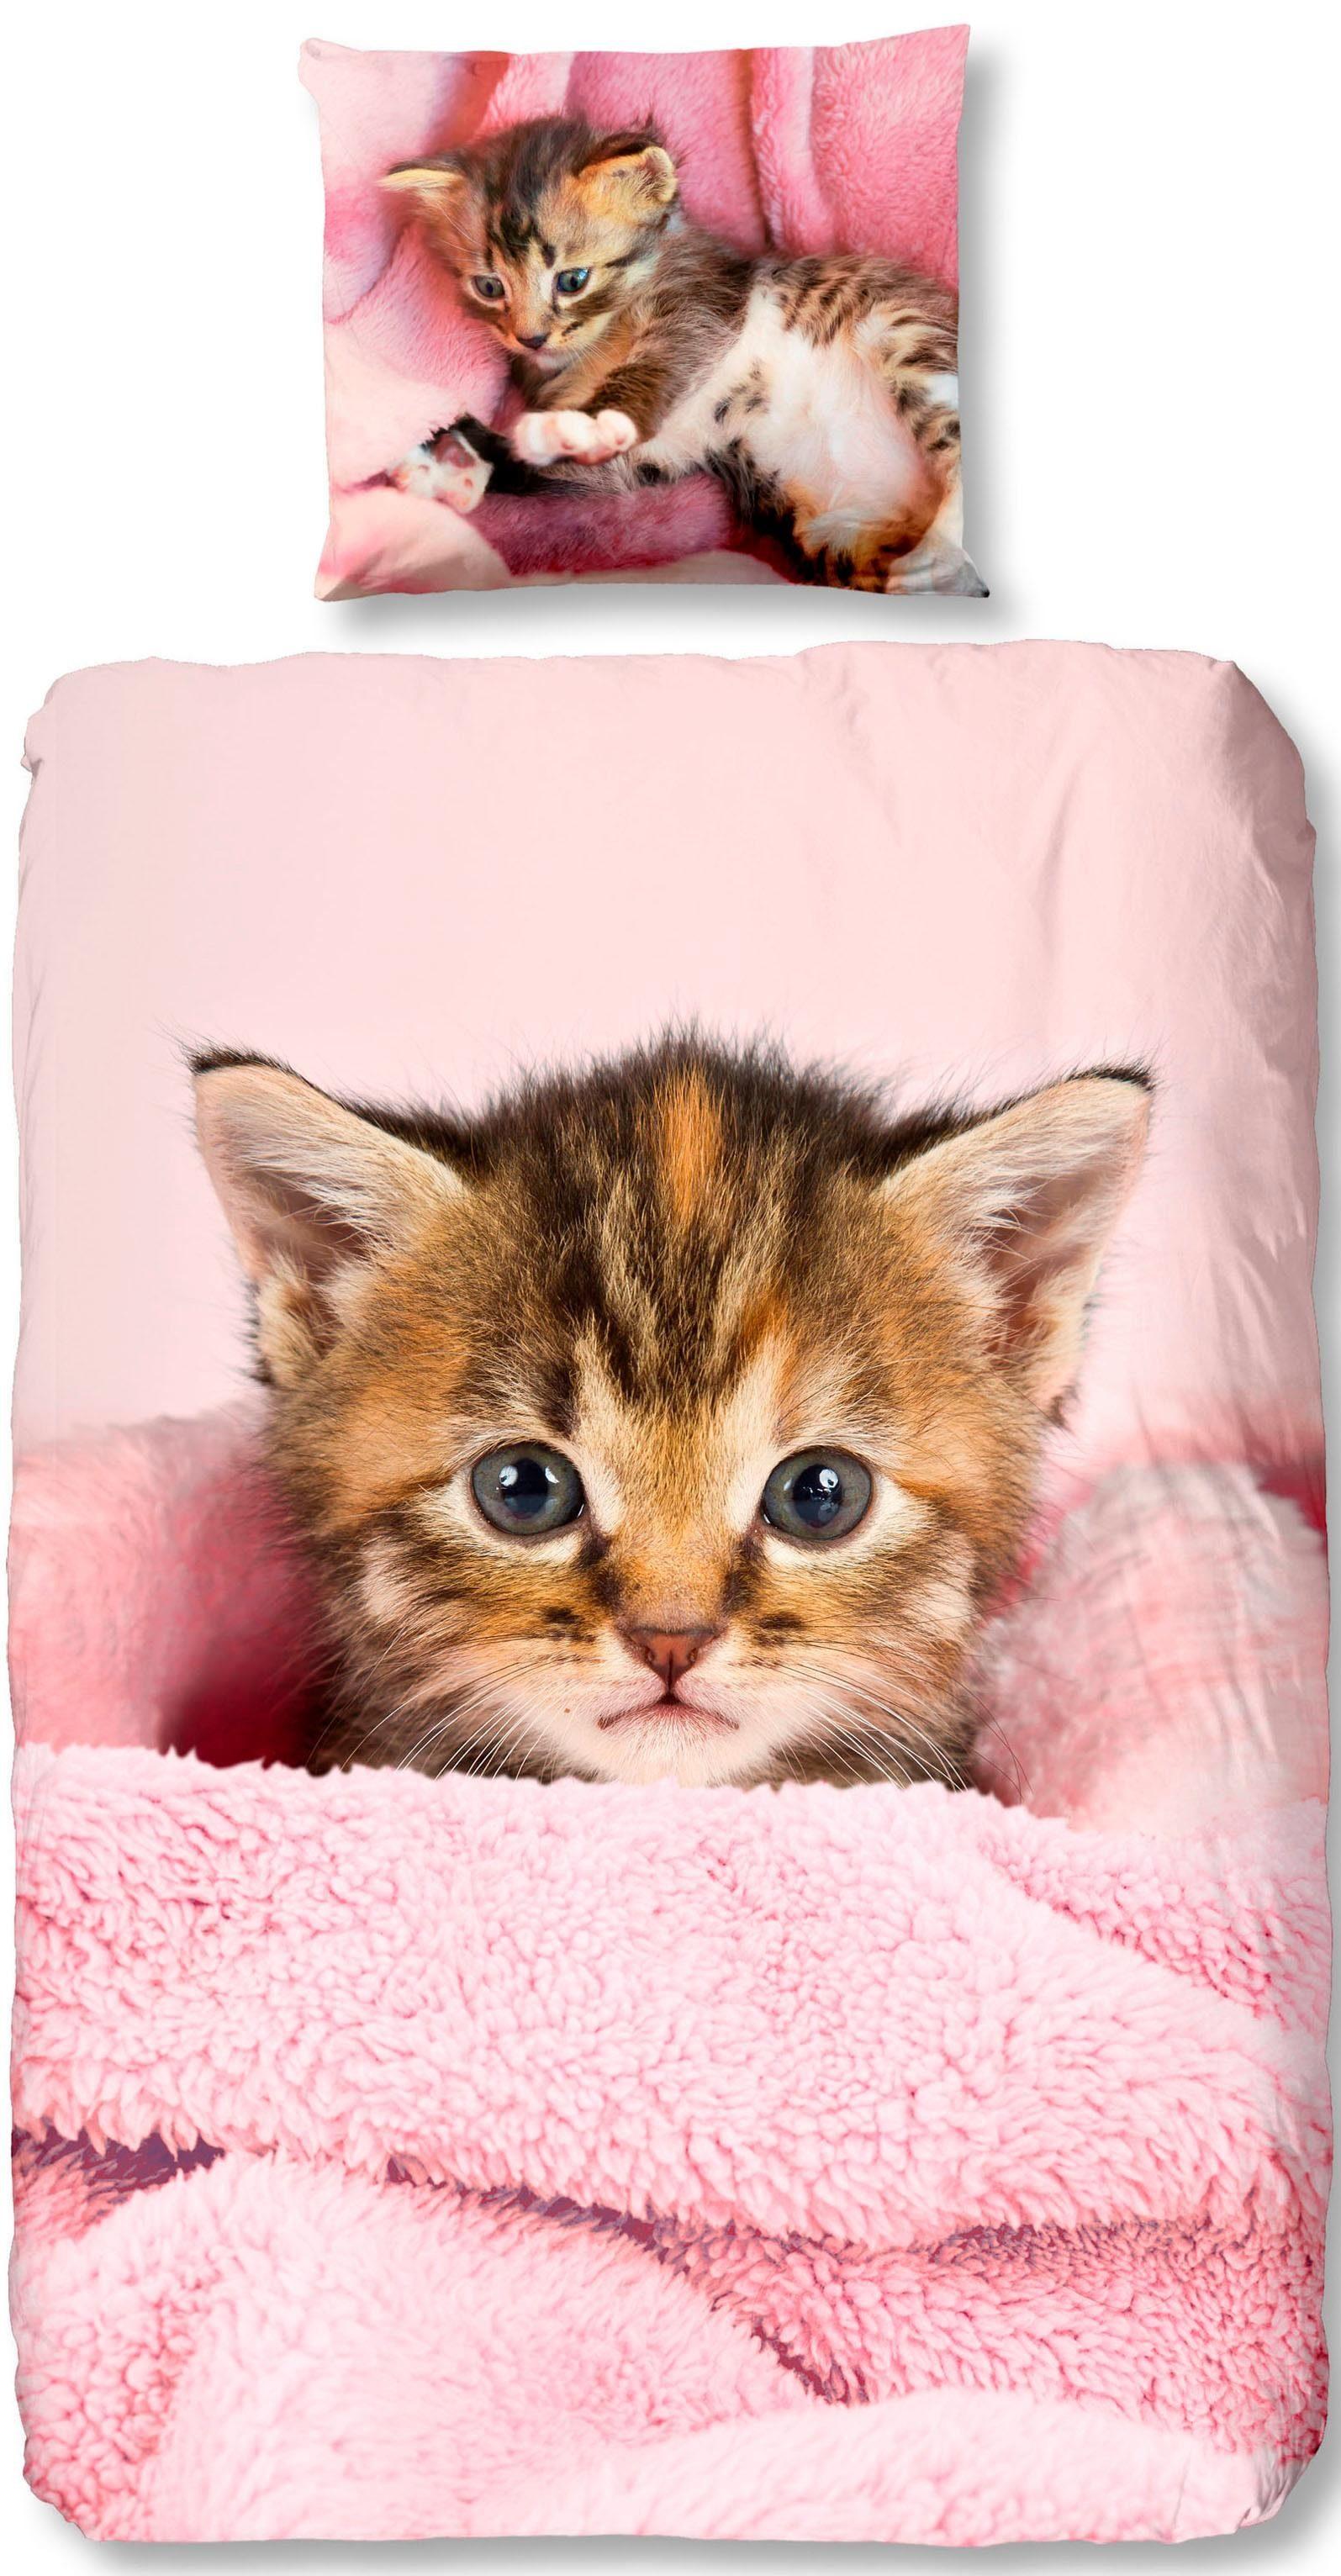 Kinderbettwäsche »Sweety«, good morning, mit Katzen Motiv